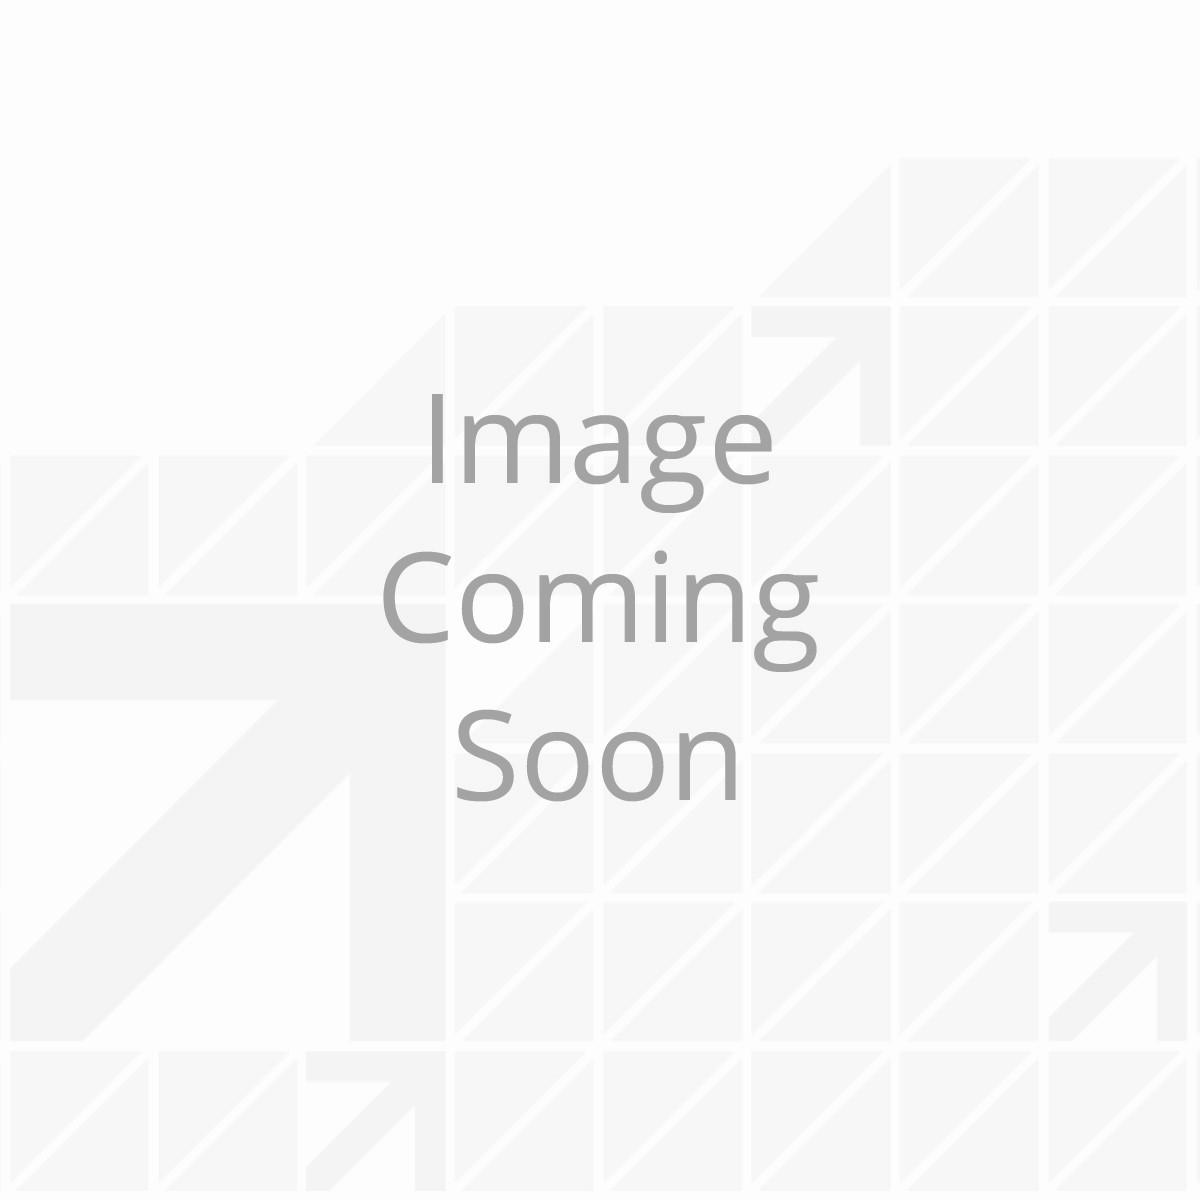 3477222_-_brookwood_chestnut_-_02_2